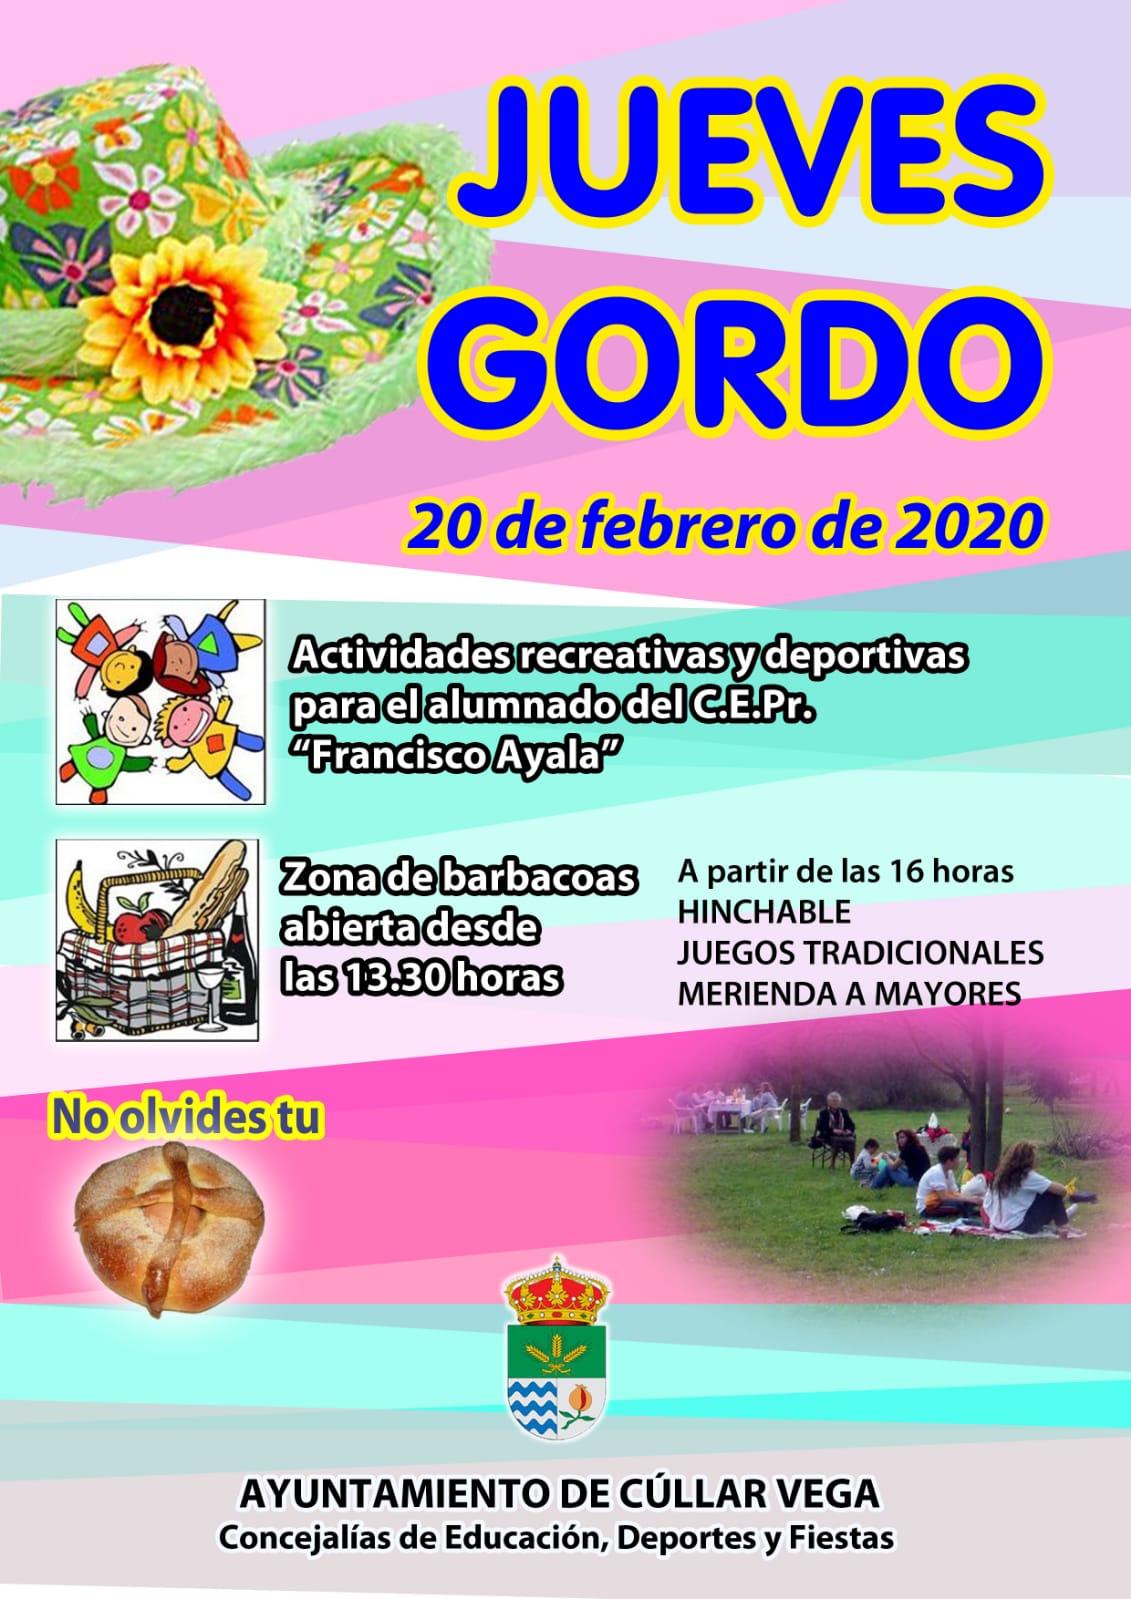 Jueves Gordo 2020